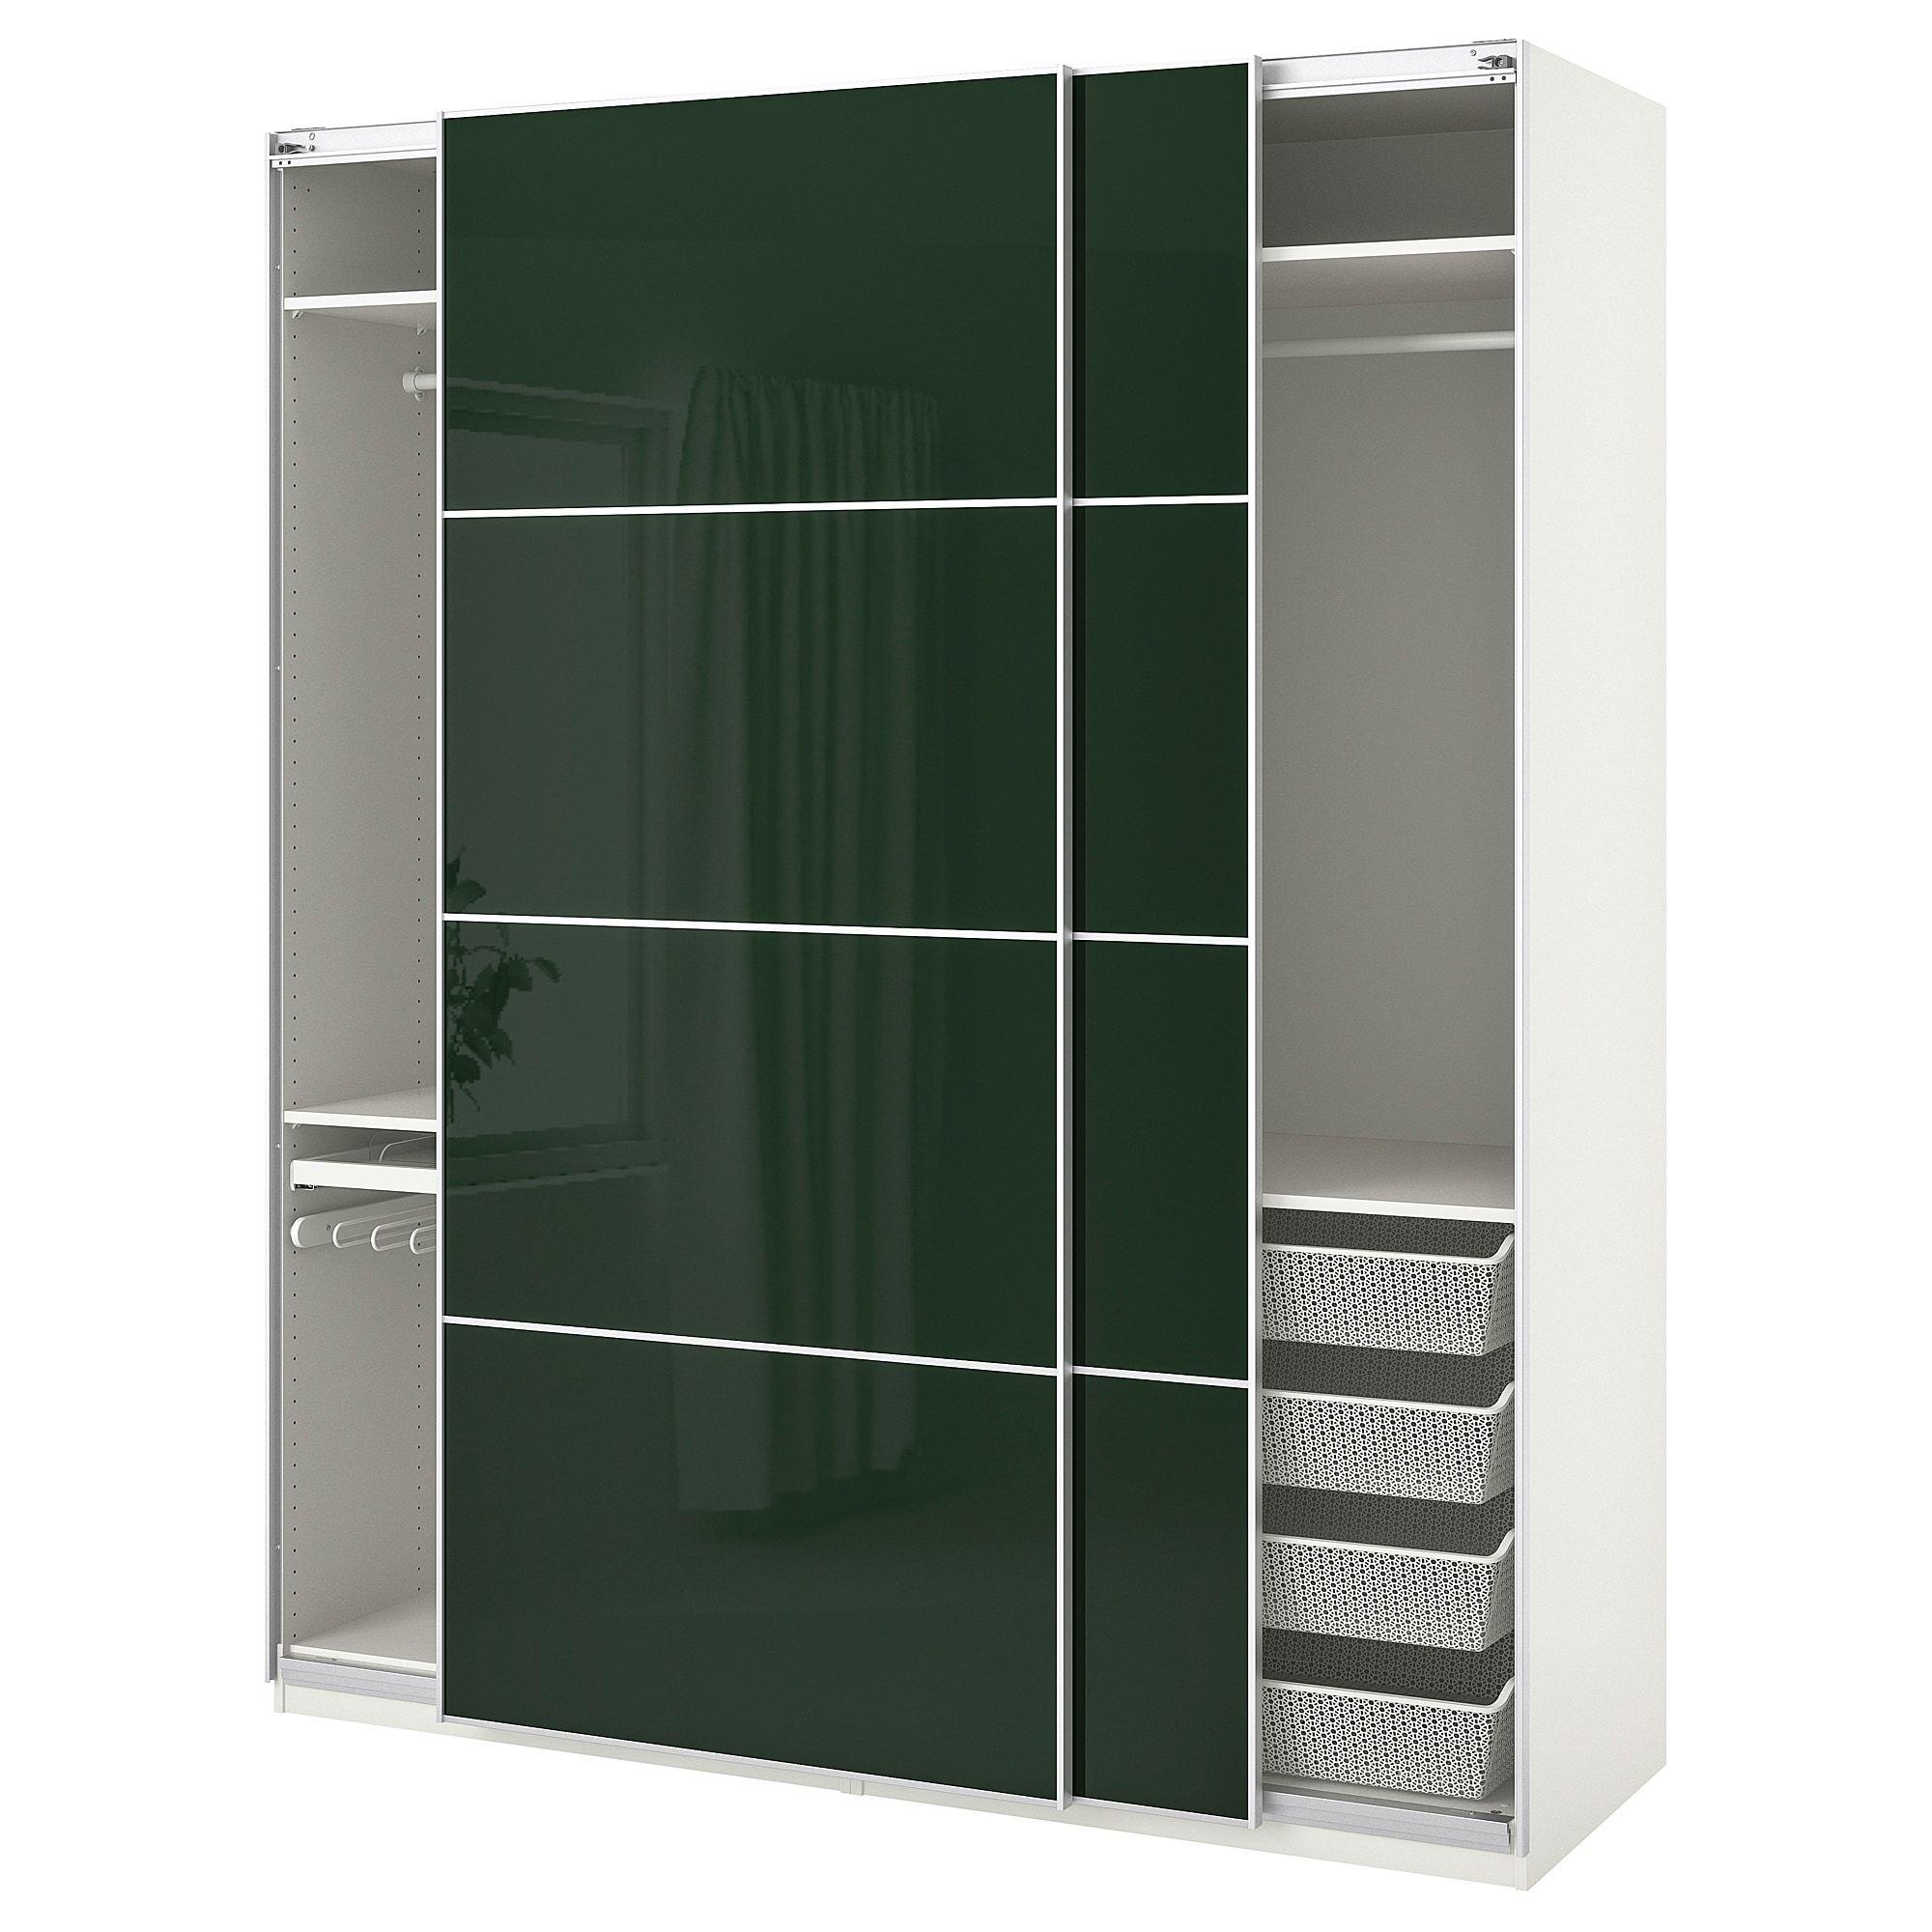 US Furniture and Home Furnishings Pax wardrobe, Ikea